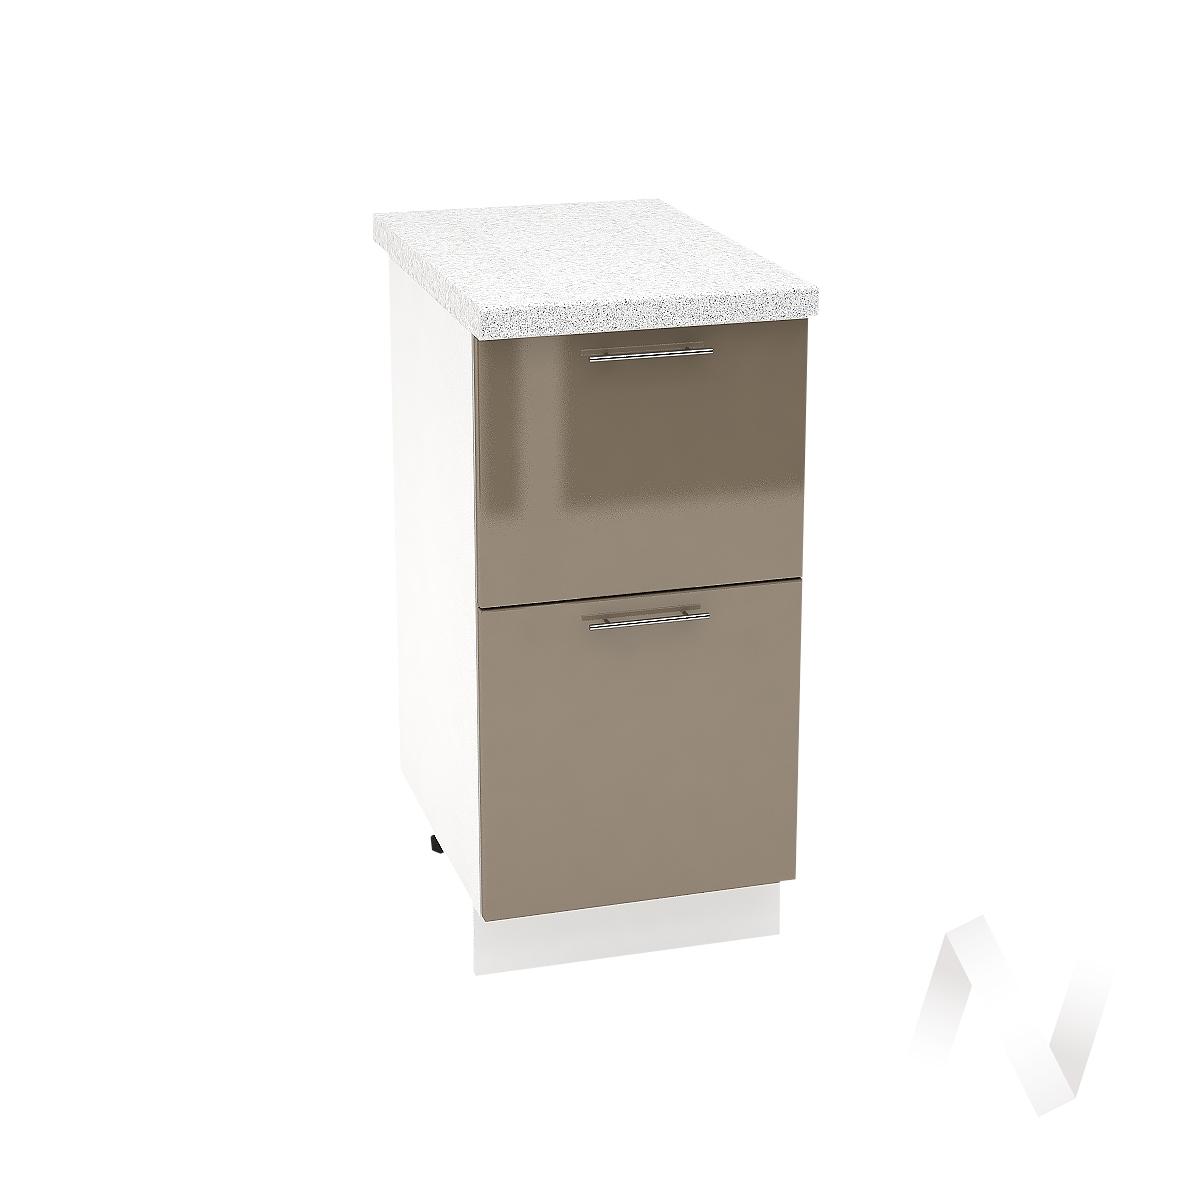 "Кухня ""Валерия-М"": Шкаф нижний с 2-мя ящиками 400, ШН2Я 400 (Капучино глянец/корпус белый)"